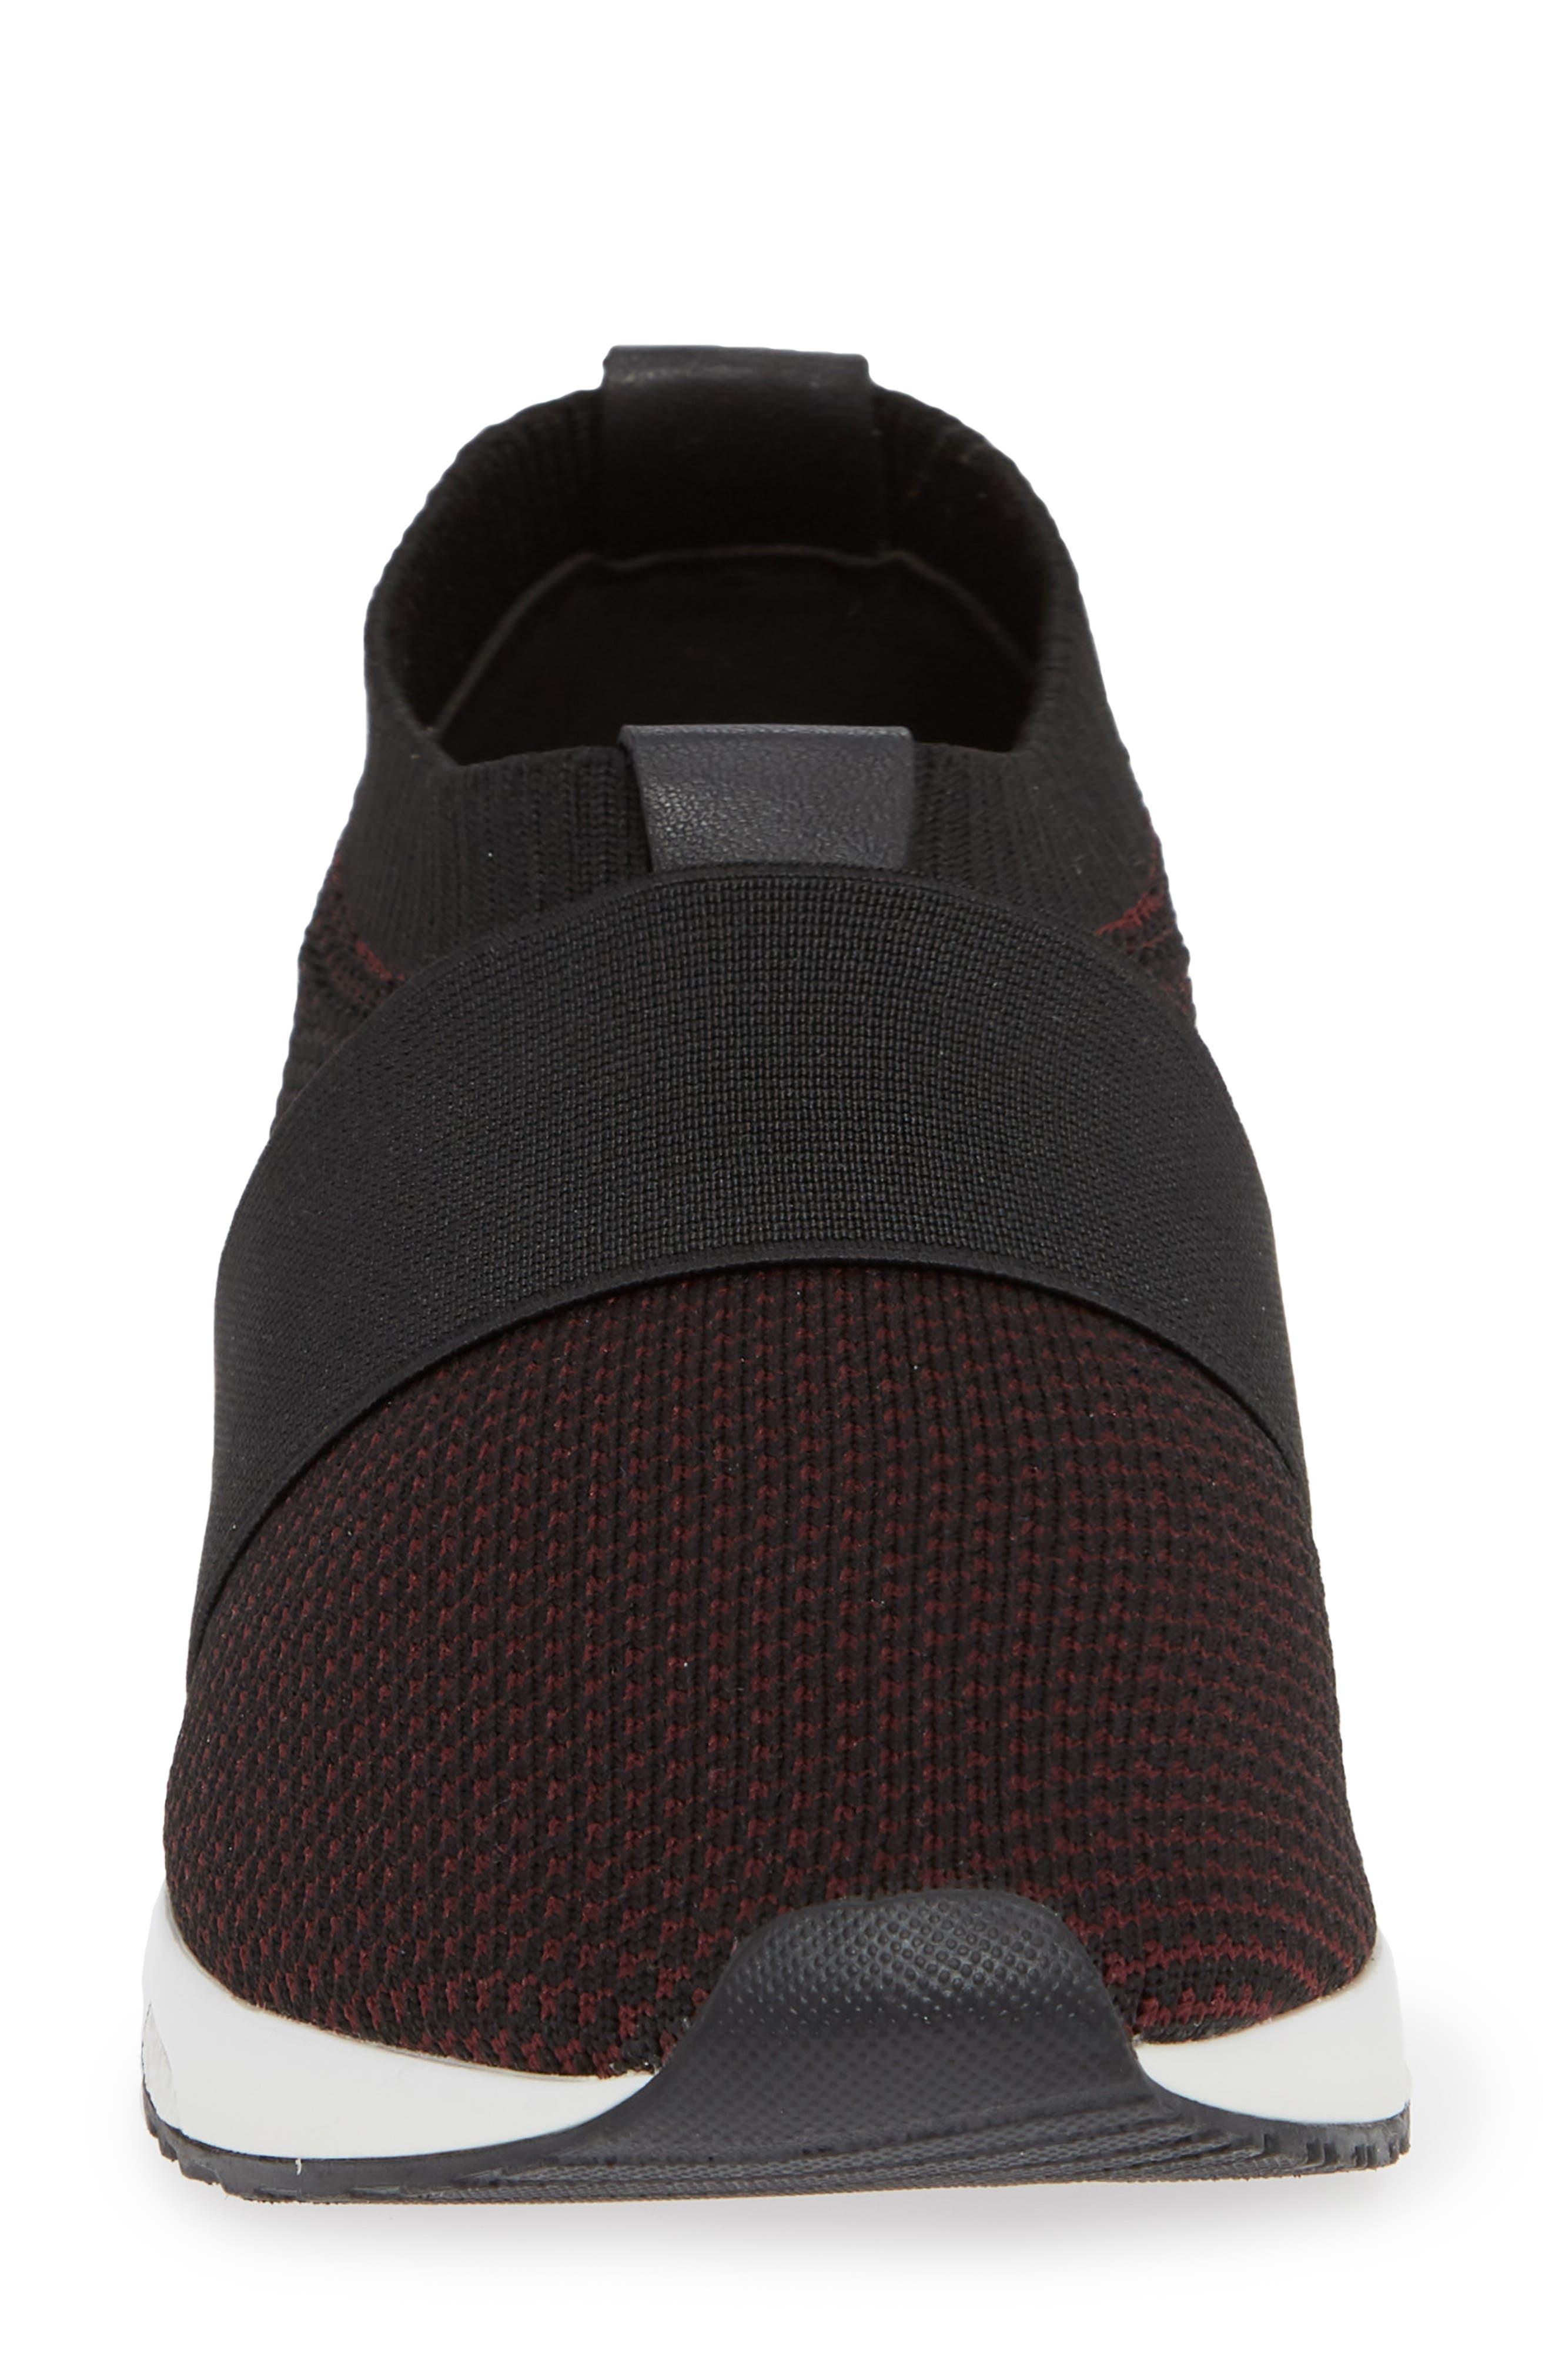 Brooke Slip-On Sneaker,                             Alternate thumbnail 4, color,                             BLACK/ WINE KNIT FABRIC